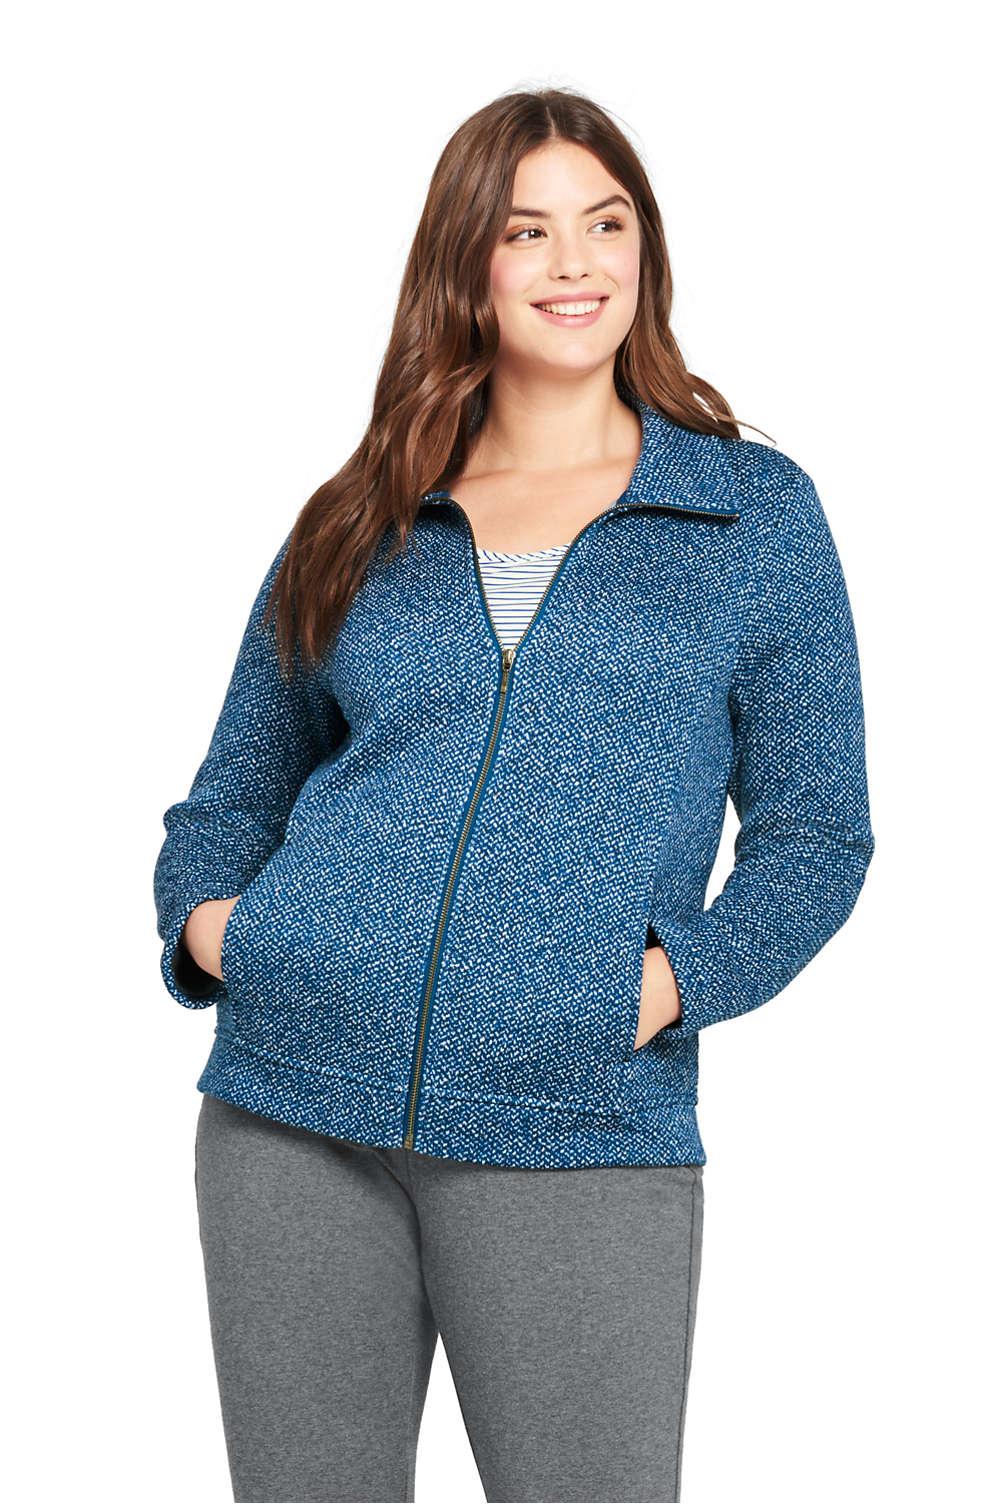 Women s Plus Size Textured Sweater Fleece Jacket from Lands  End a6646e067